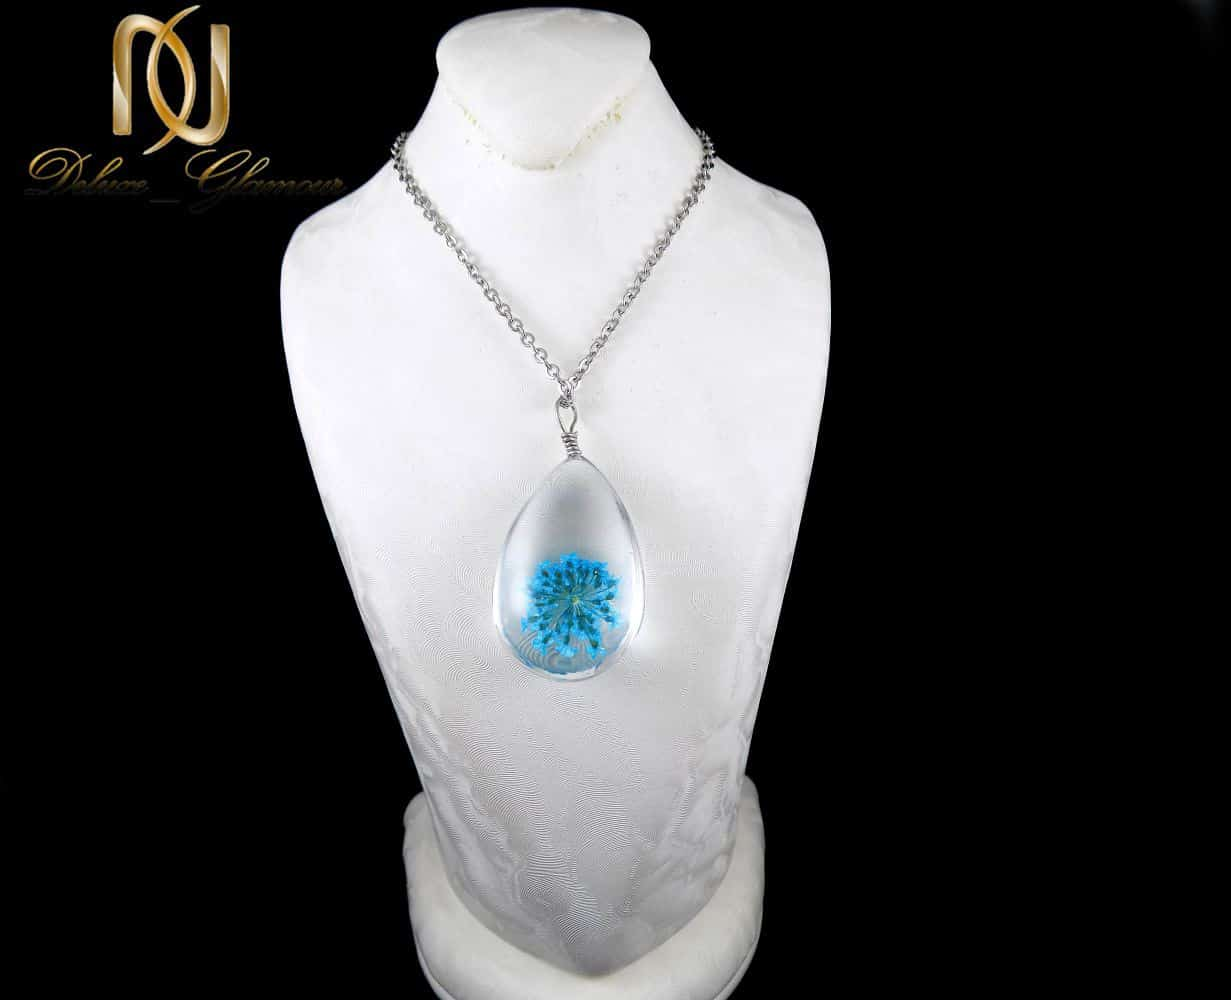 گردنبند رومانتویی طرح آکواریوم گل خشک آبی به همراه زنجیر nw-n196 (2)